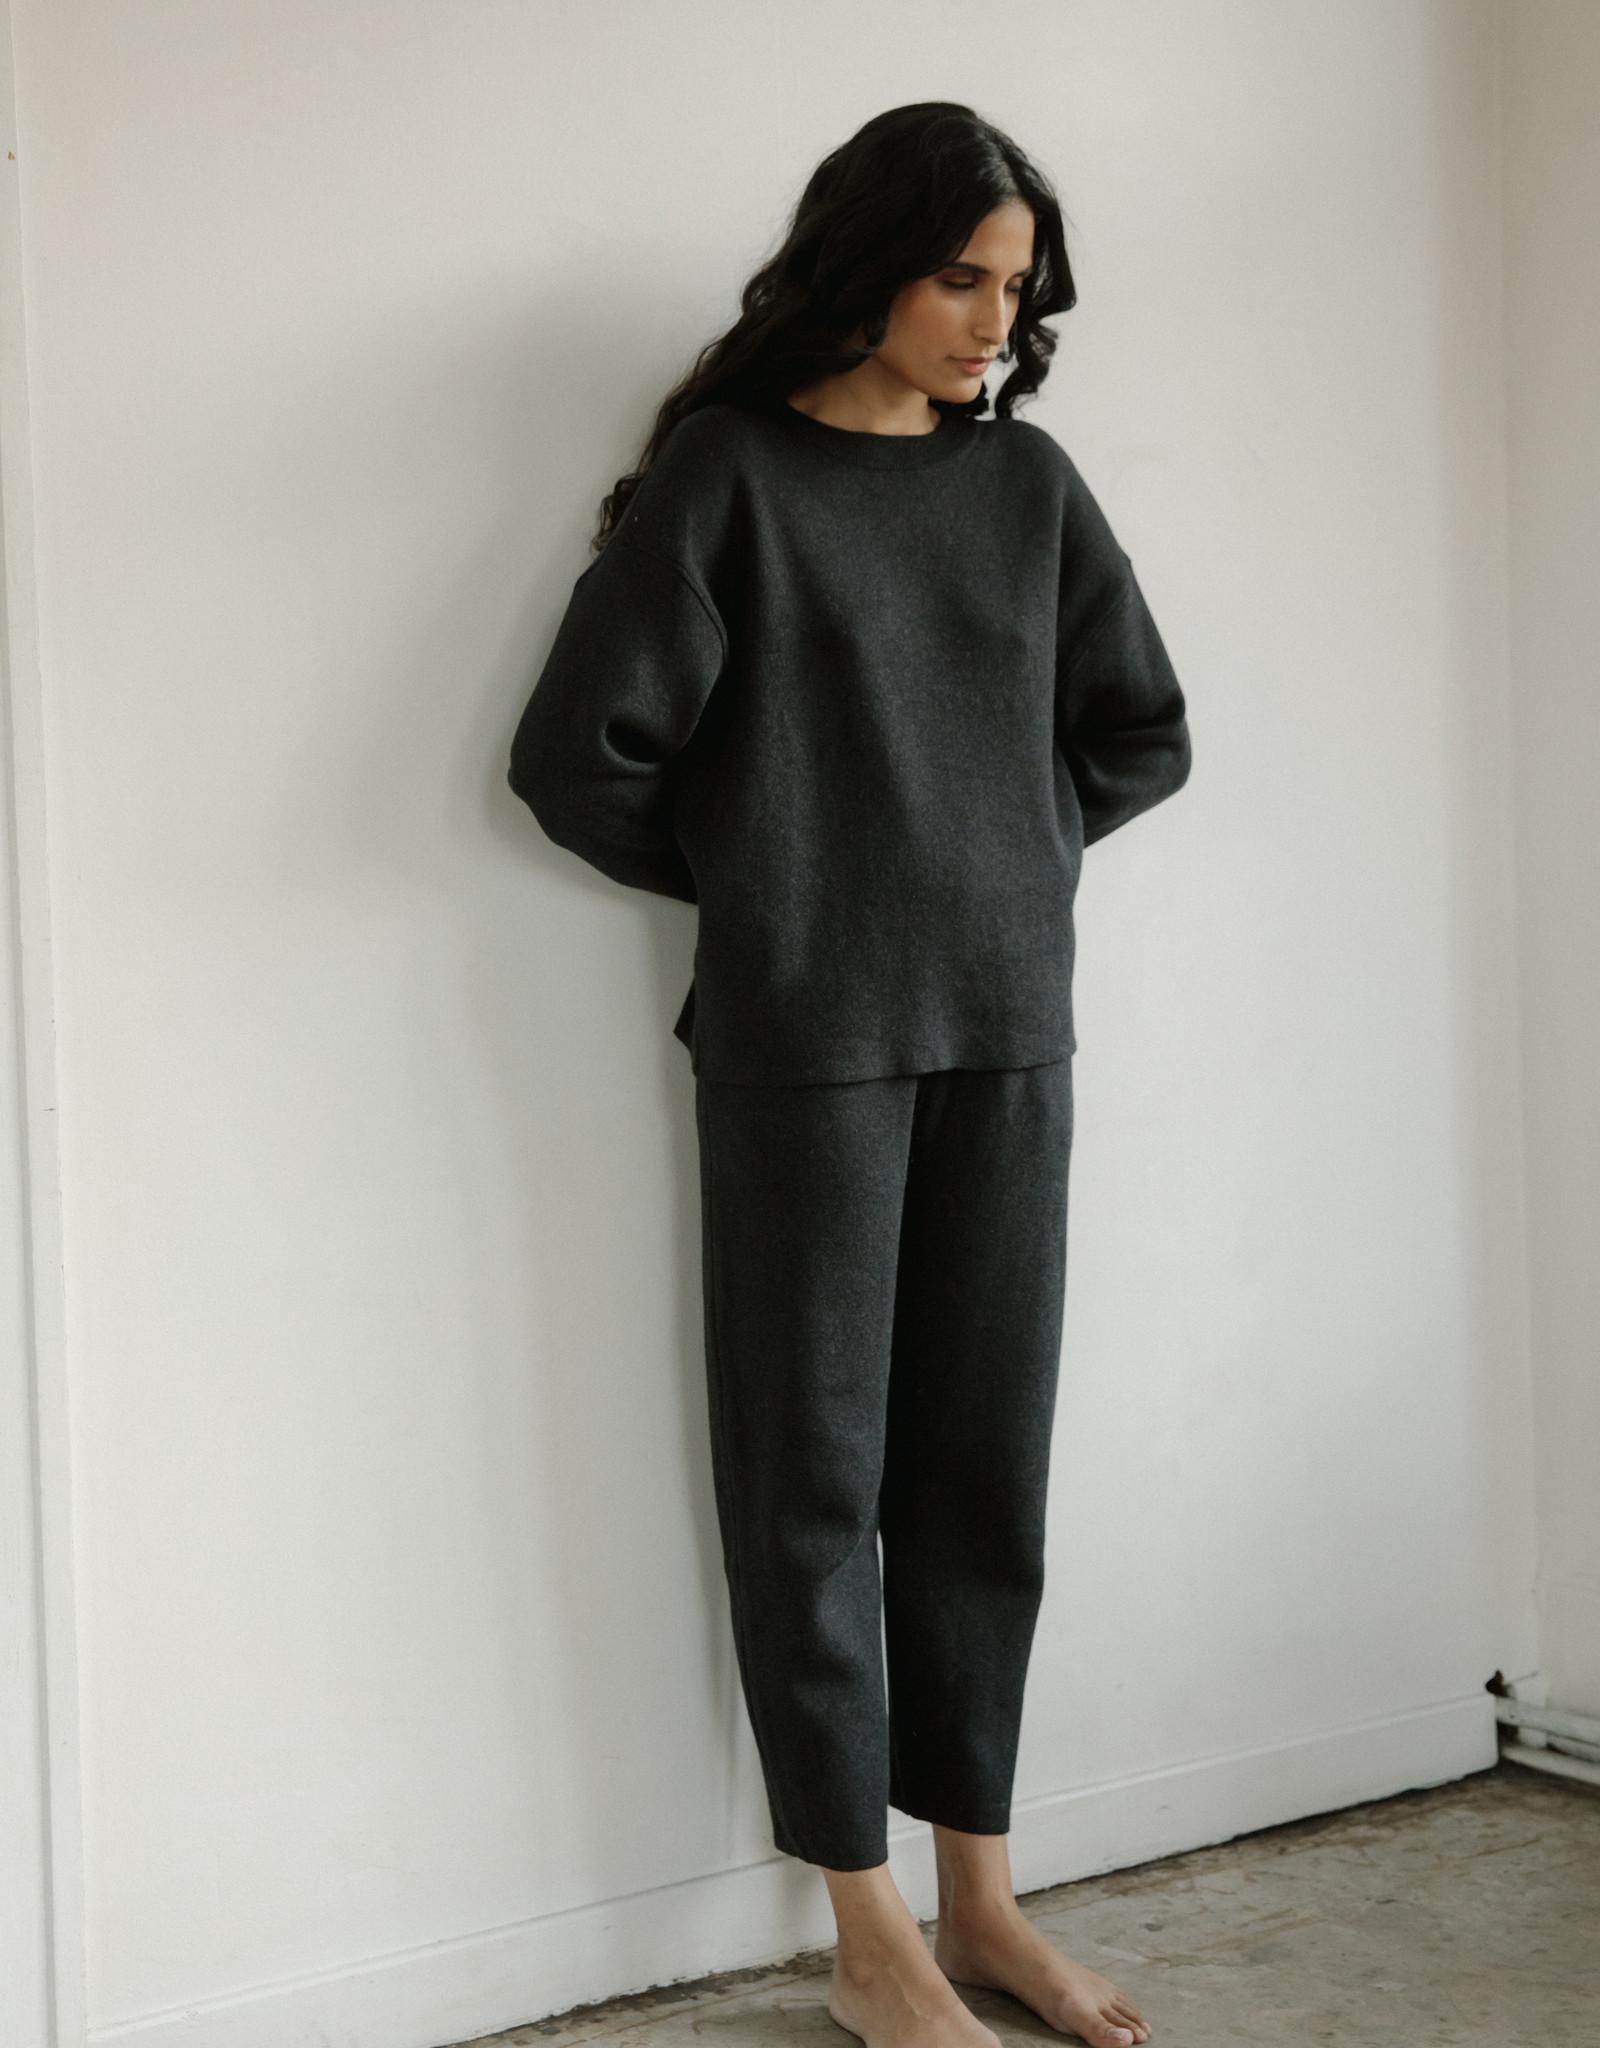 Bare Knitwear xs-s Graphite Lounge Crew